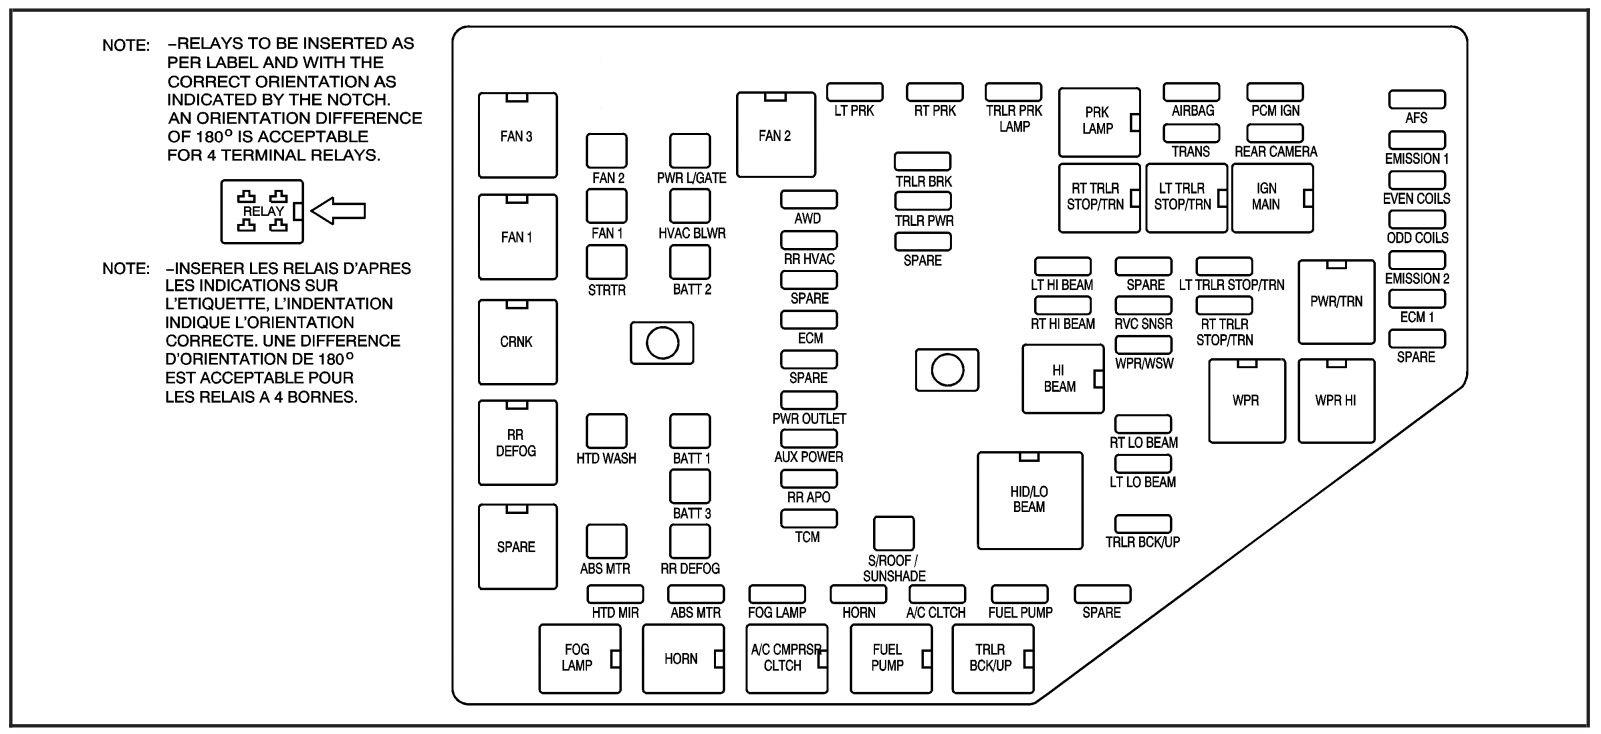 2012 gmc acadia fuse diagram data wiring diagram Plymouth Acclaim Fuse Box